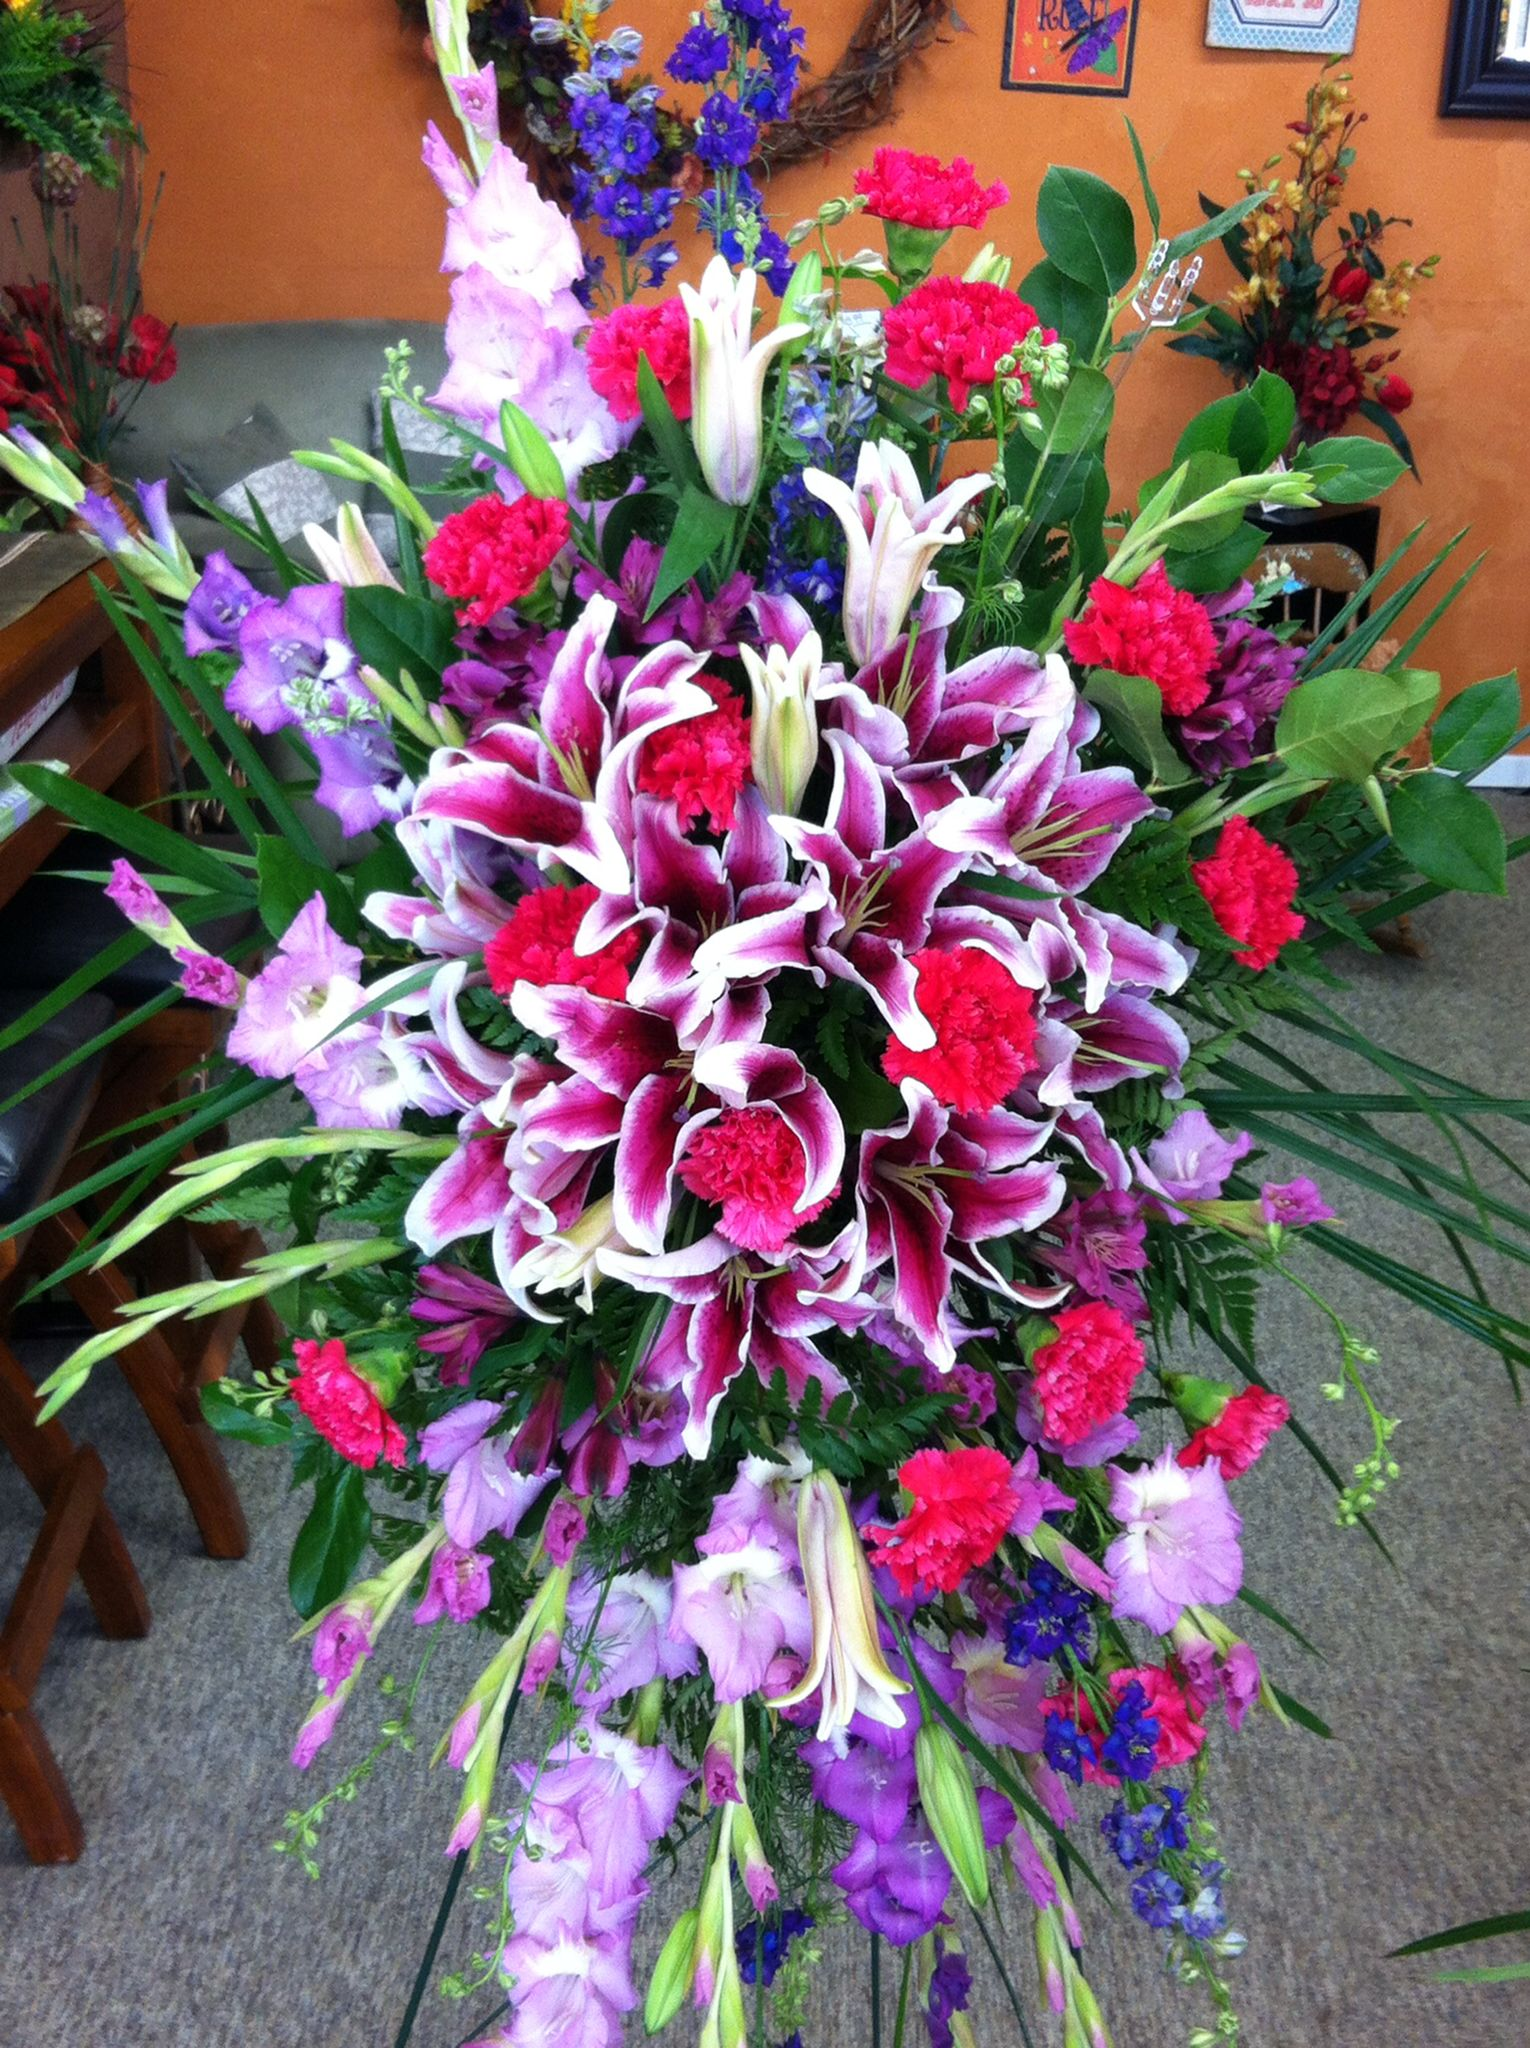 Funeral spray funeral sprays floral shop floral wreath